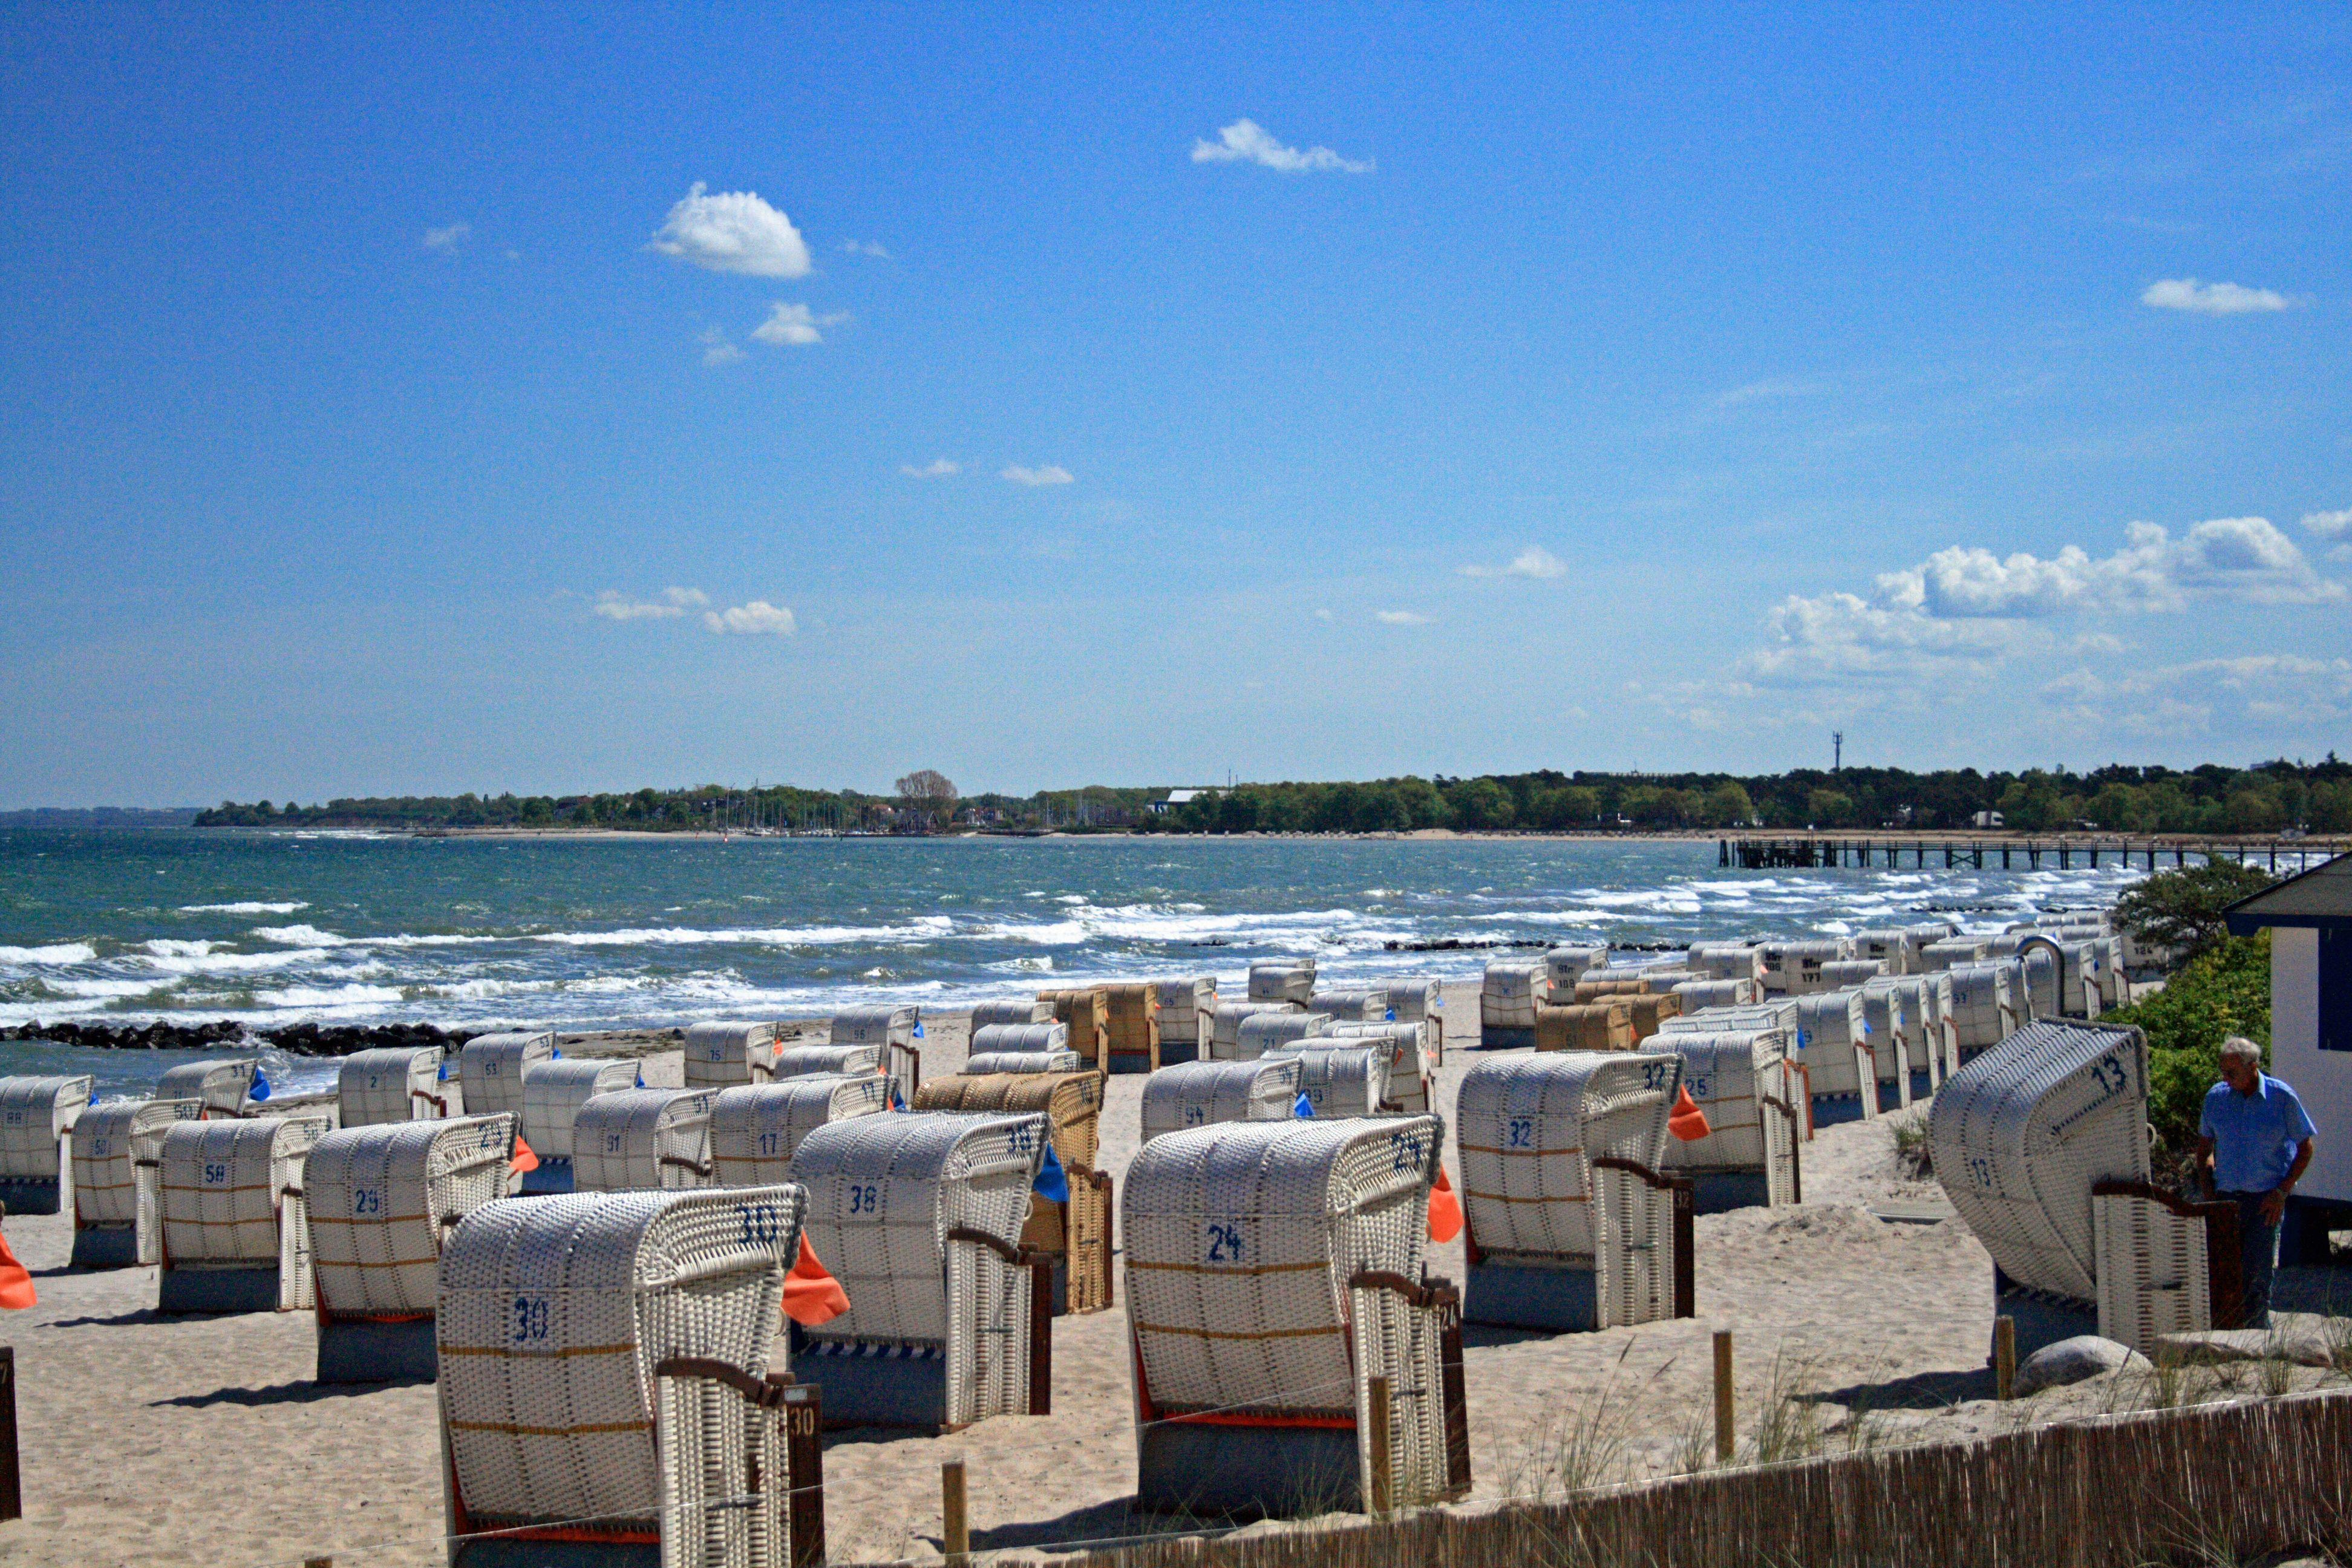 Timmendorfer Strand | Timmendorfer strand, Strandkorb, Strand